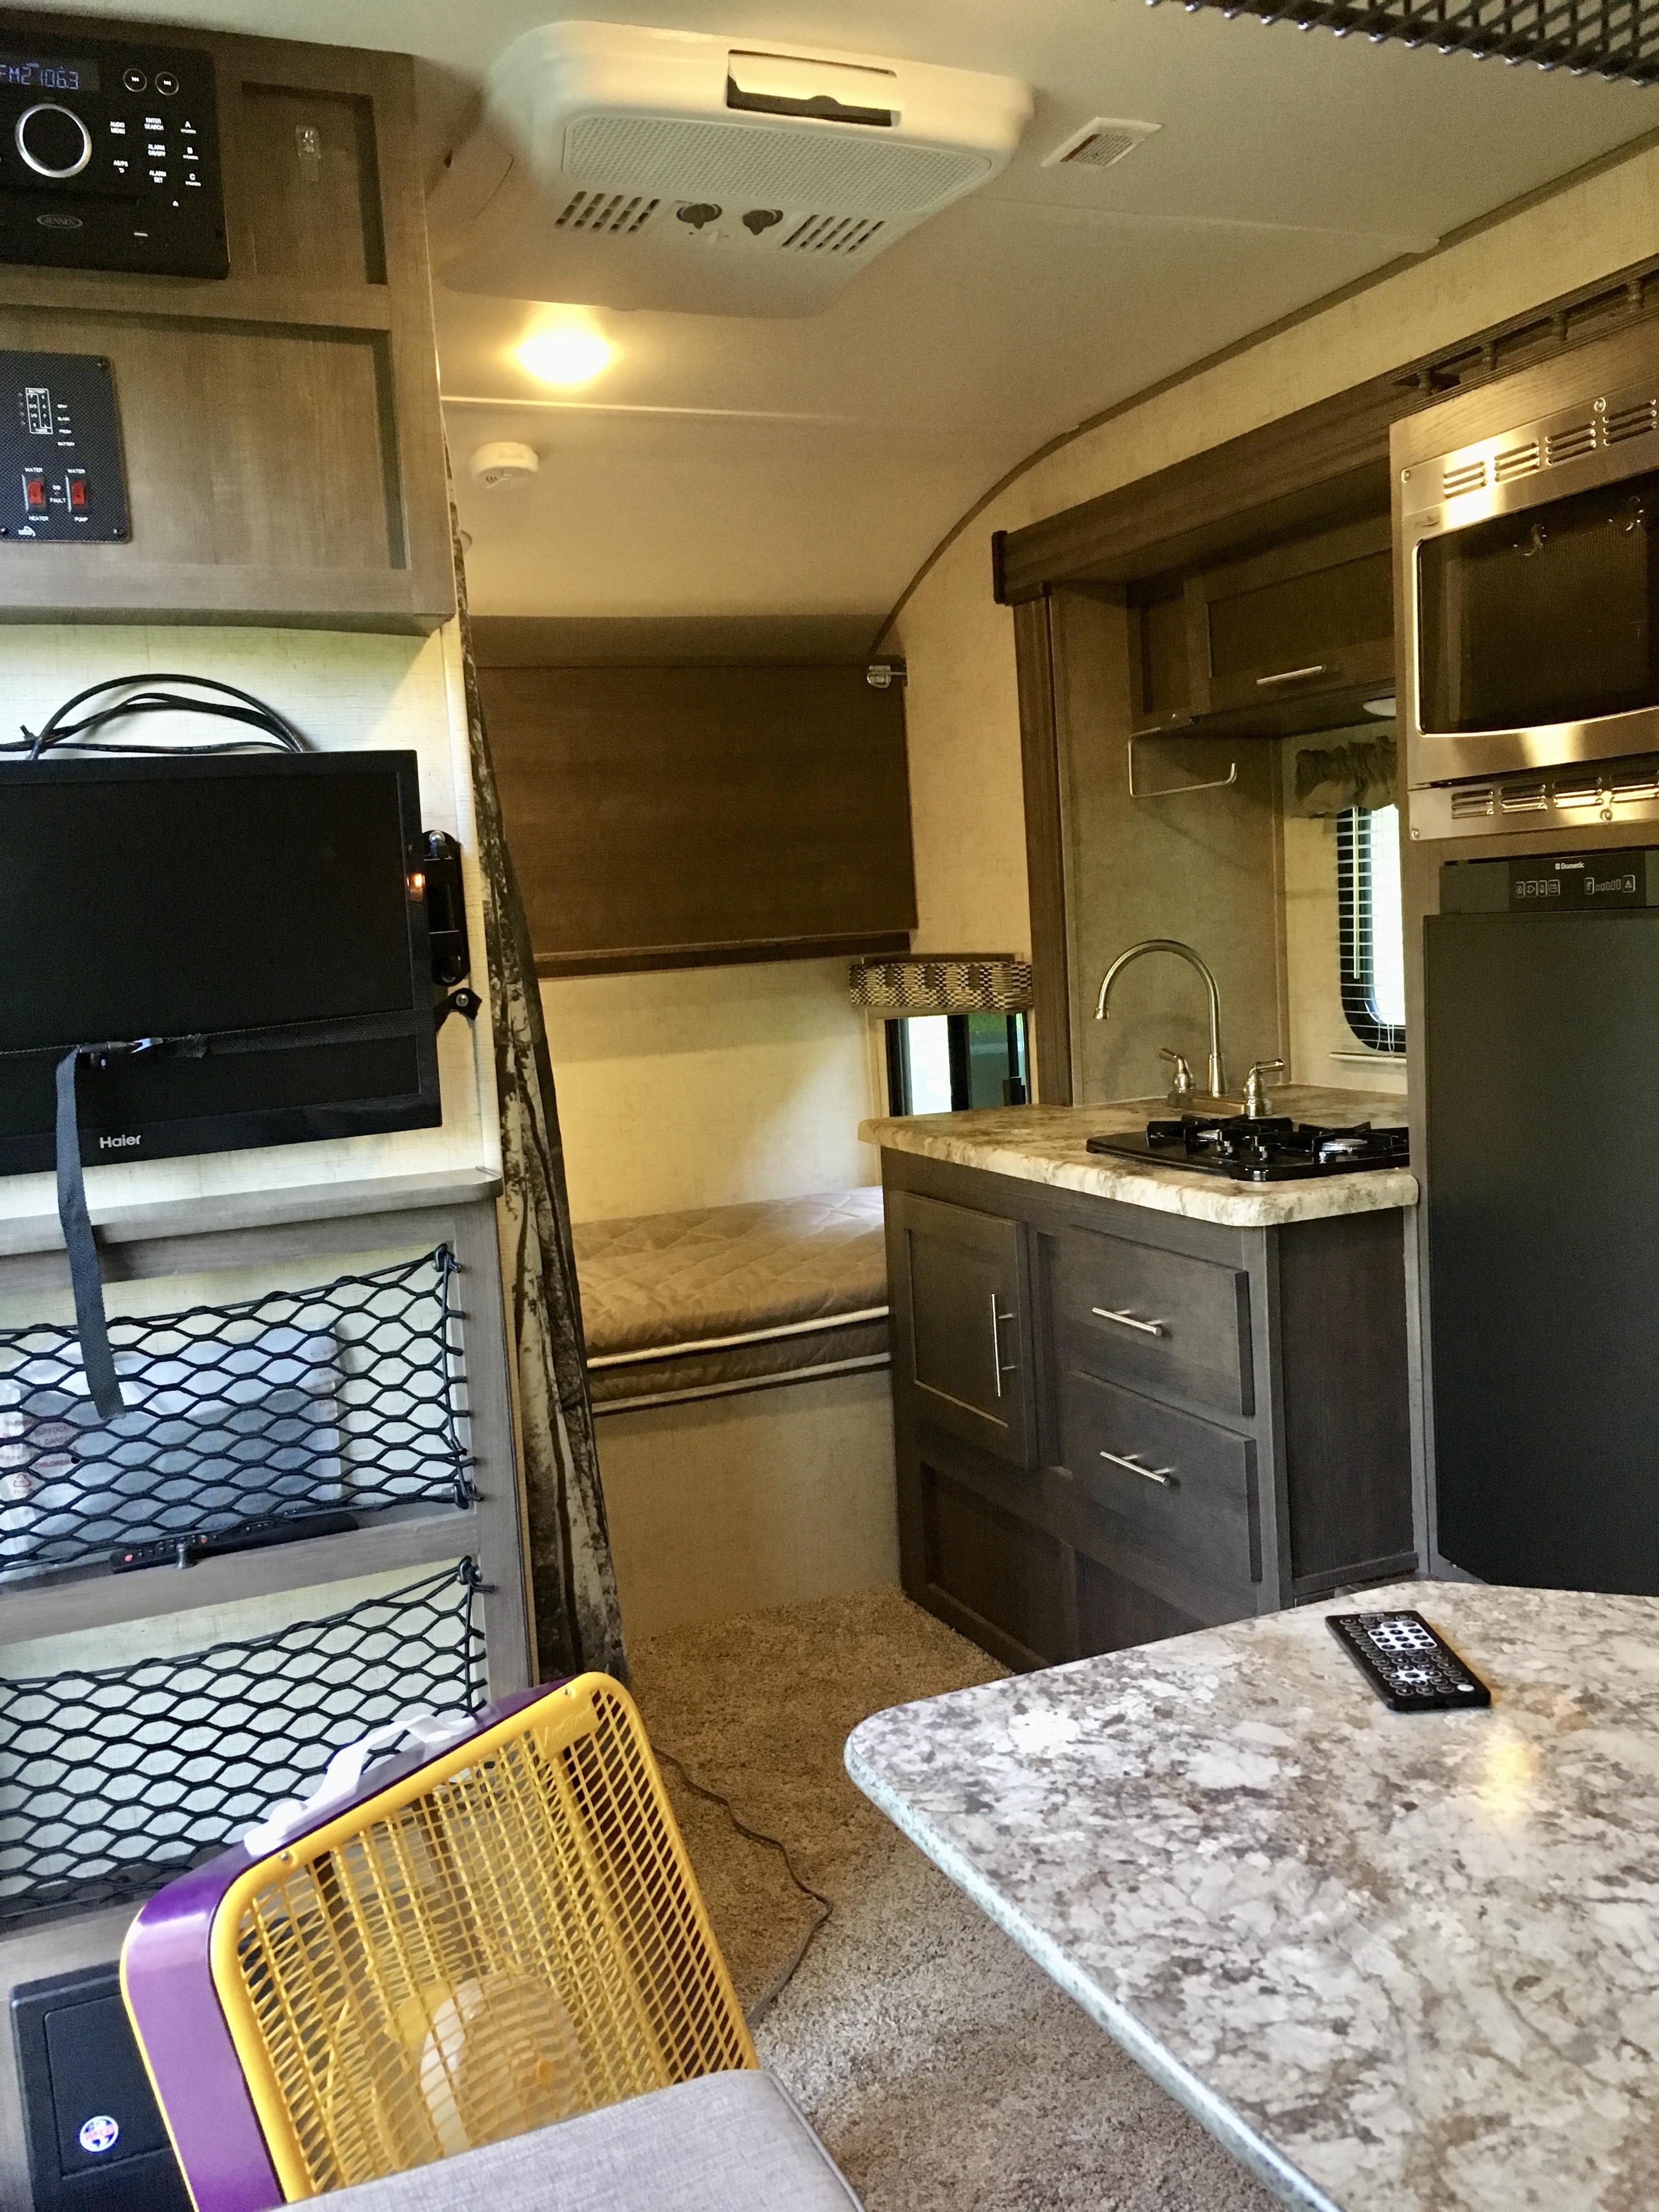 Kitchen/twin bed/indoor bath. ForestRiver R-Pod 2017